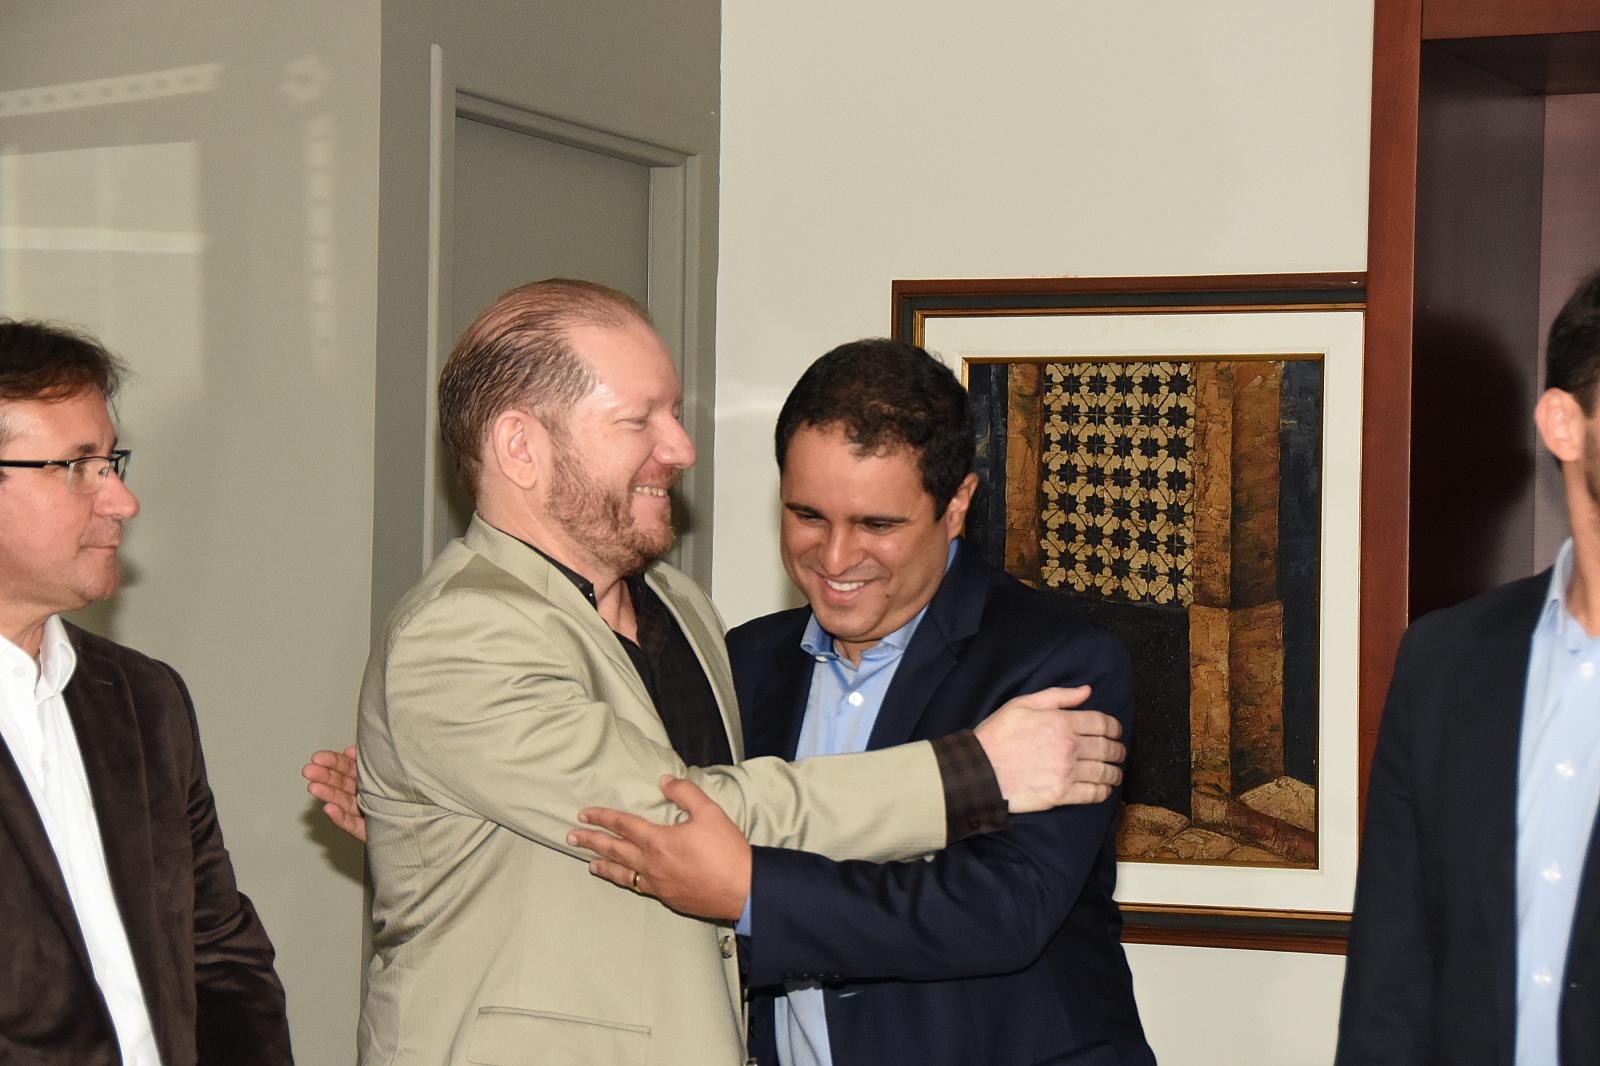 Deputado Othelino Neto recebeu a visita de Edivaldo holanda Jr